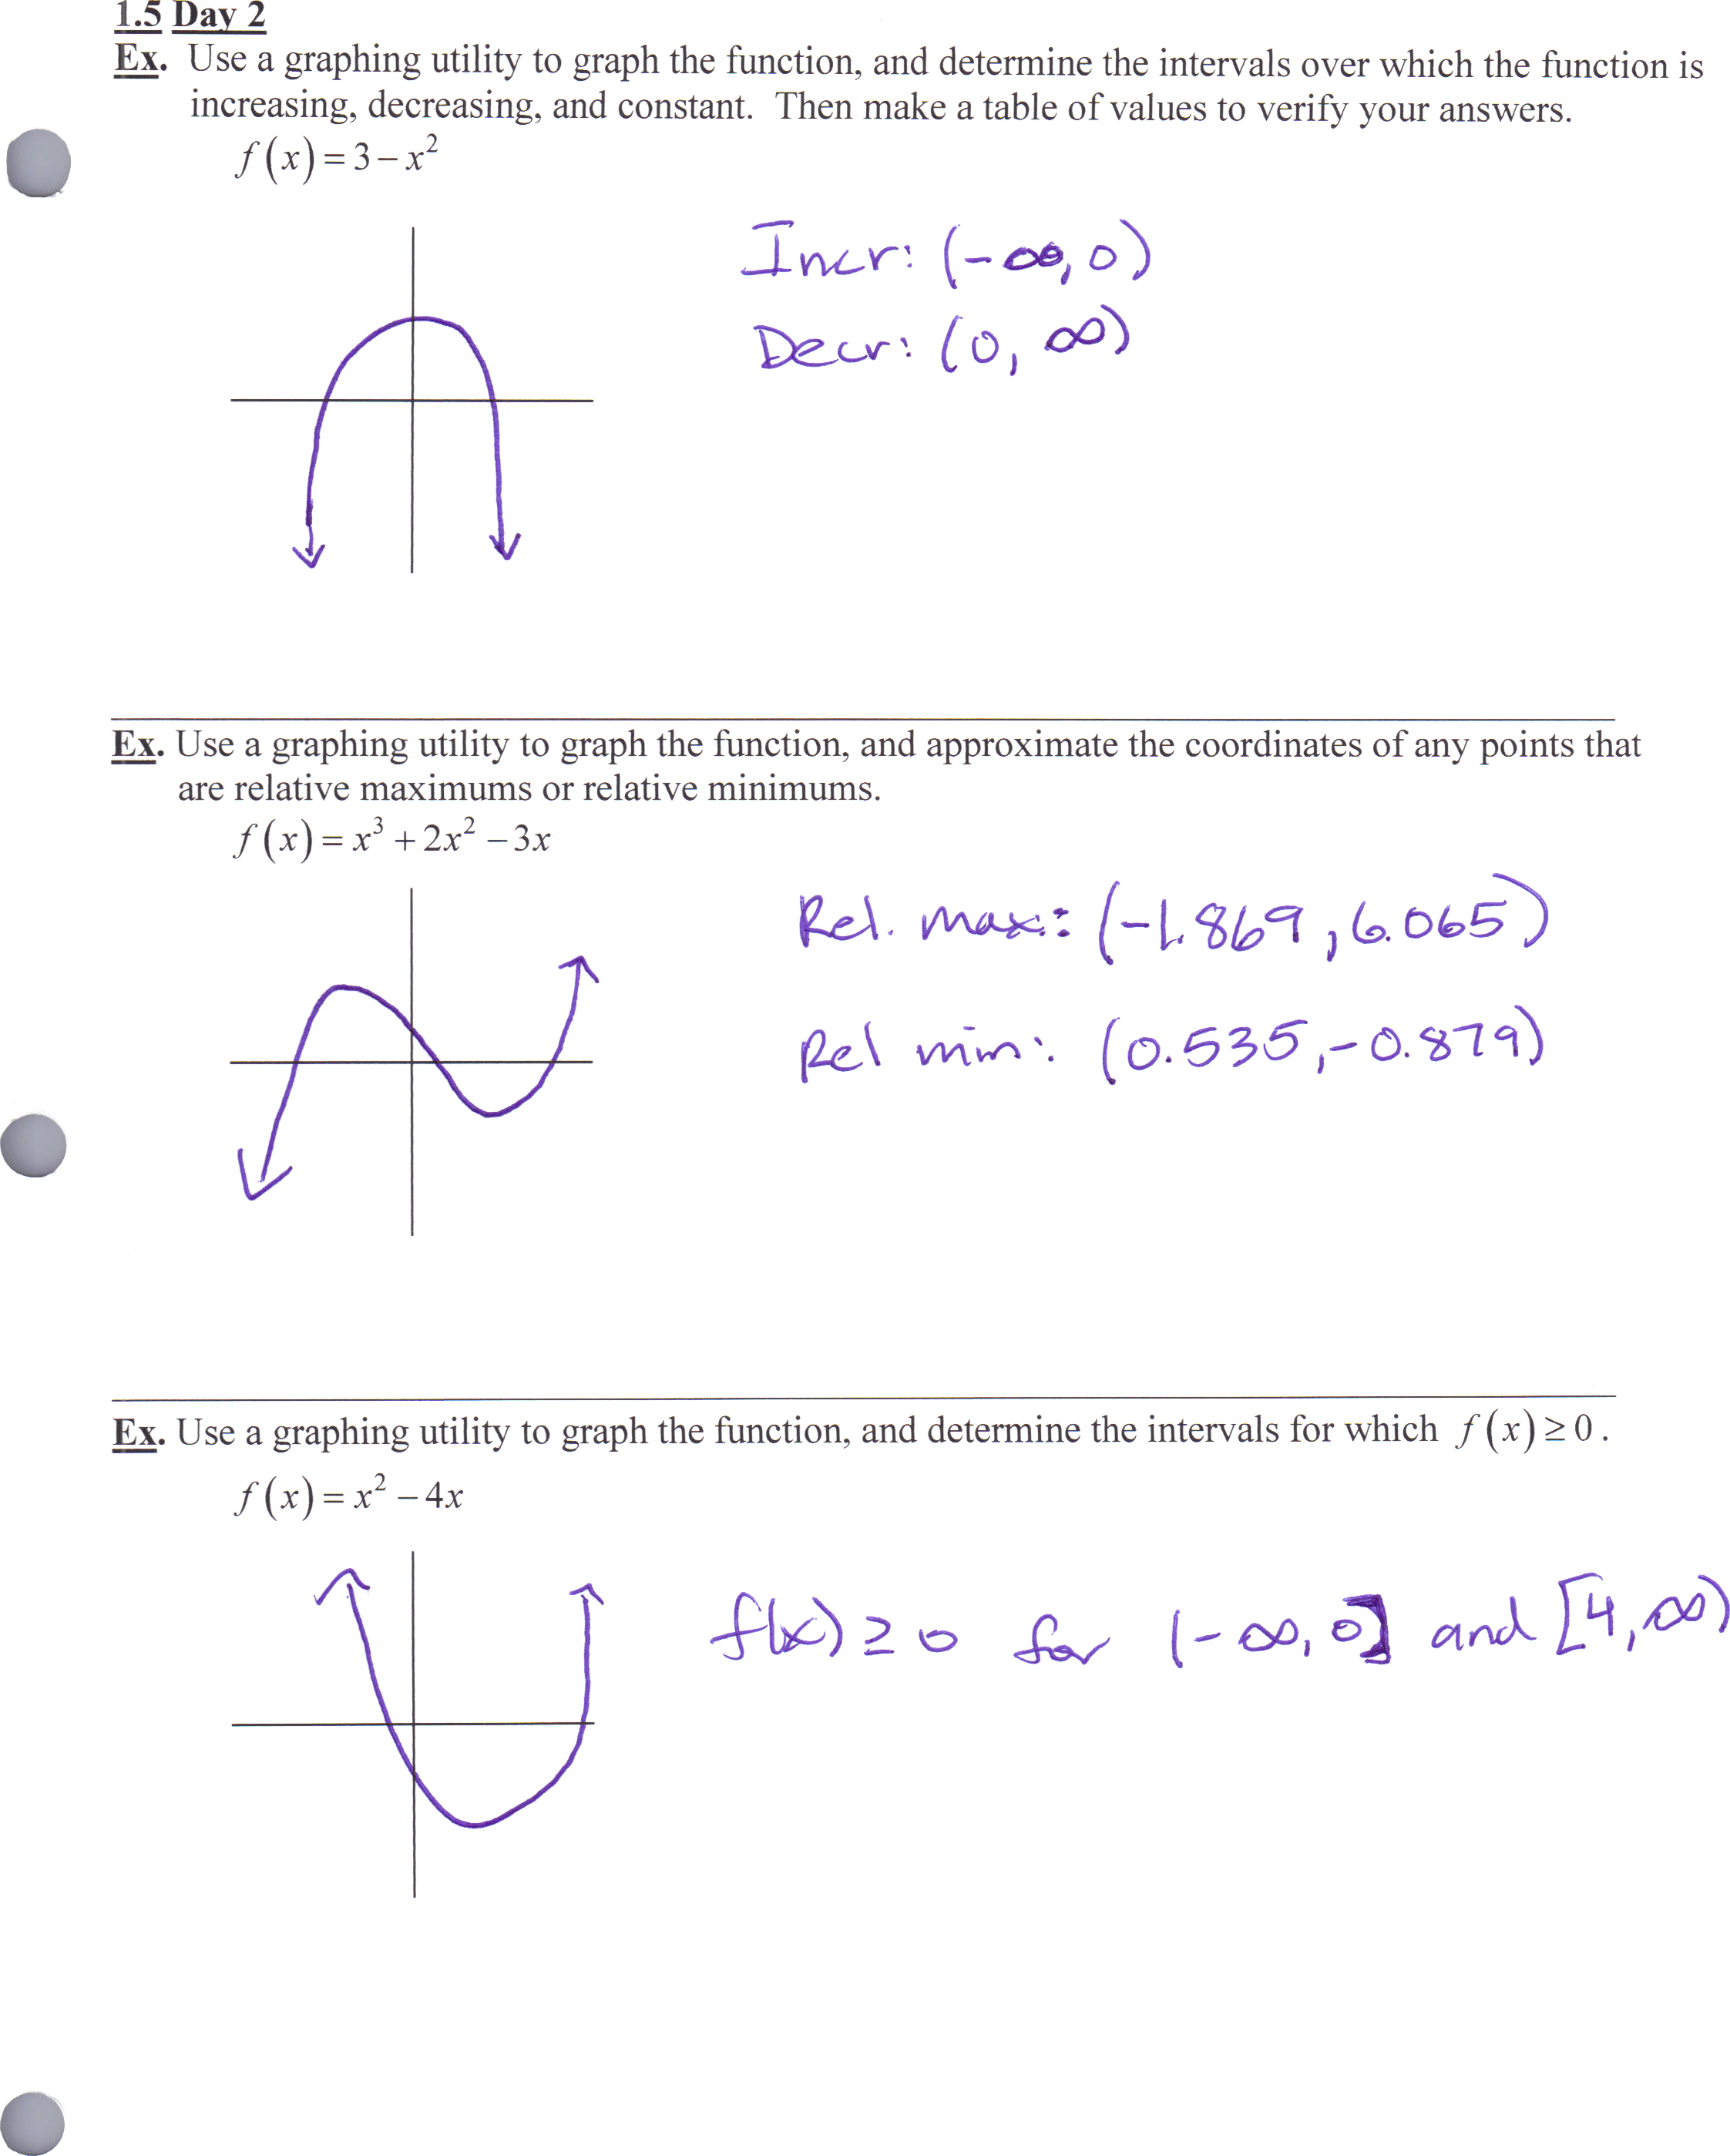 Precalculus Homework 4 5 Worksheet 2 Answers